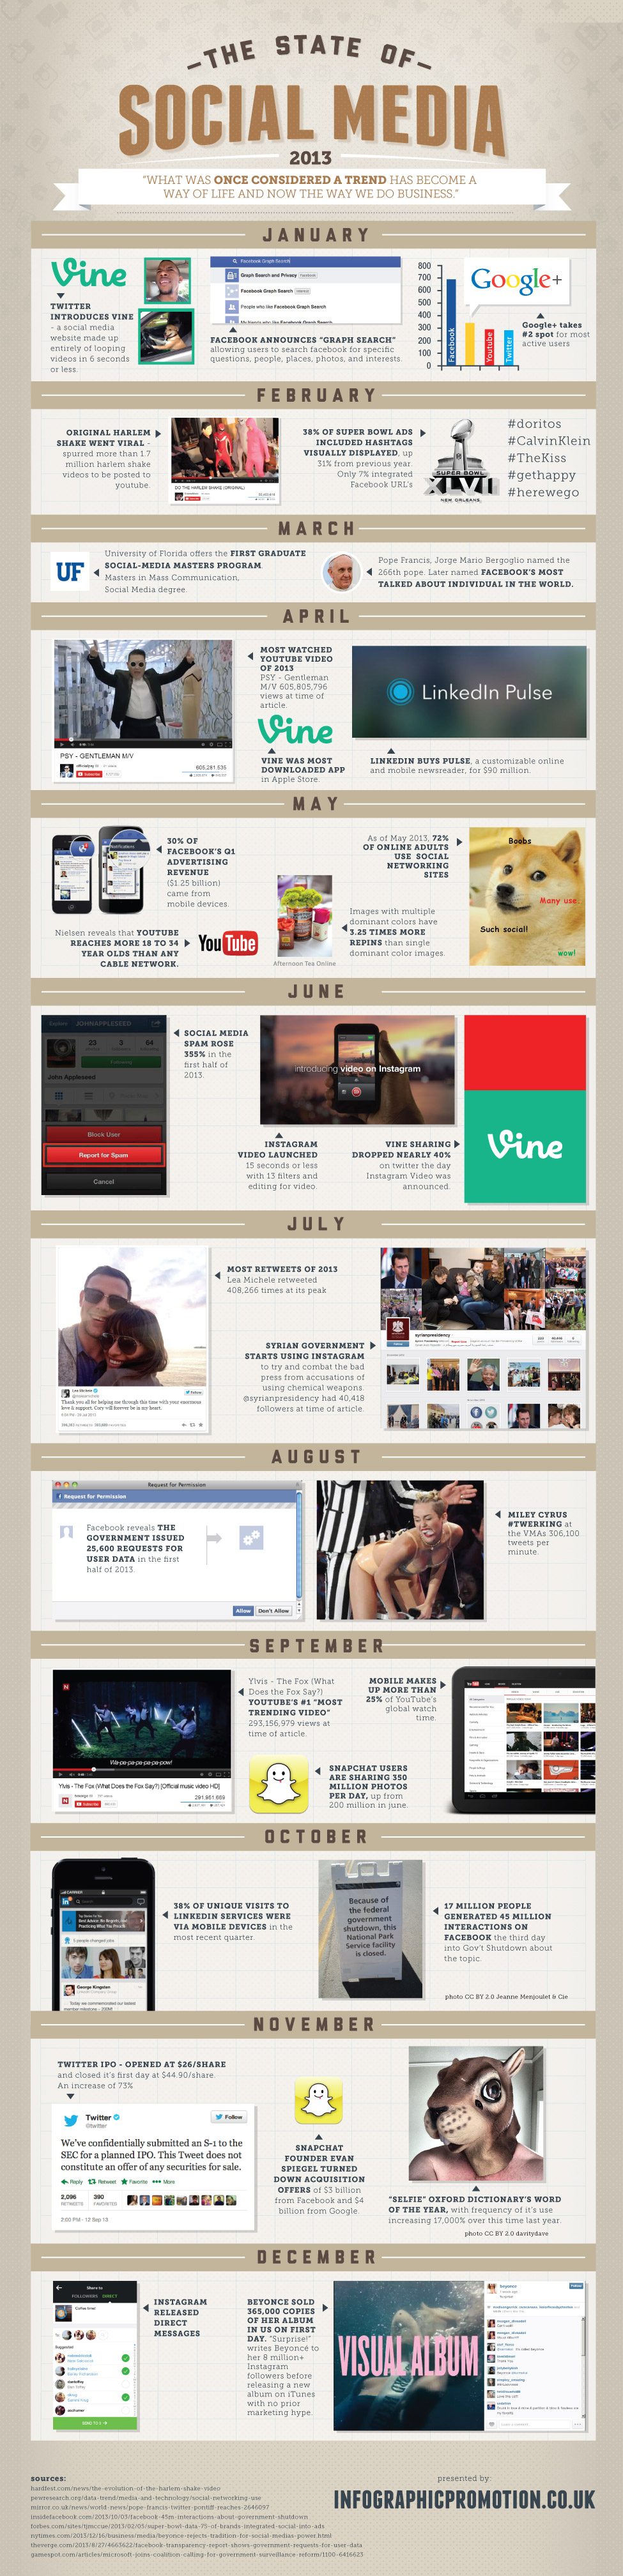 state-of-social-media-2013